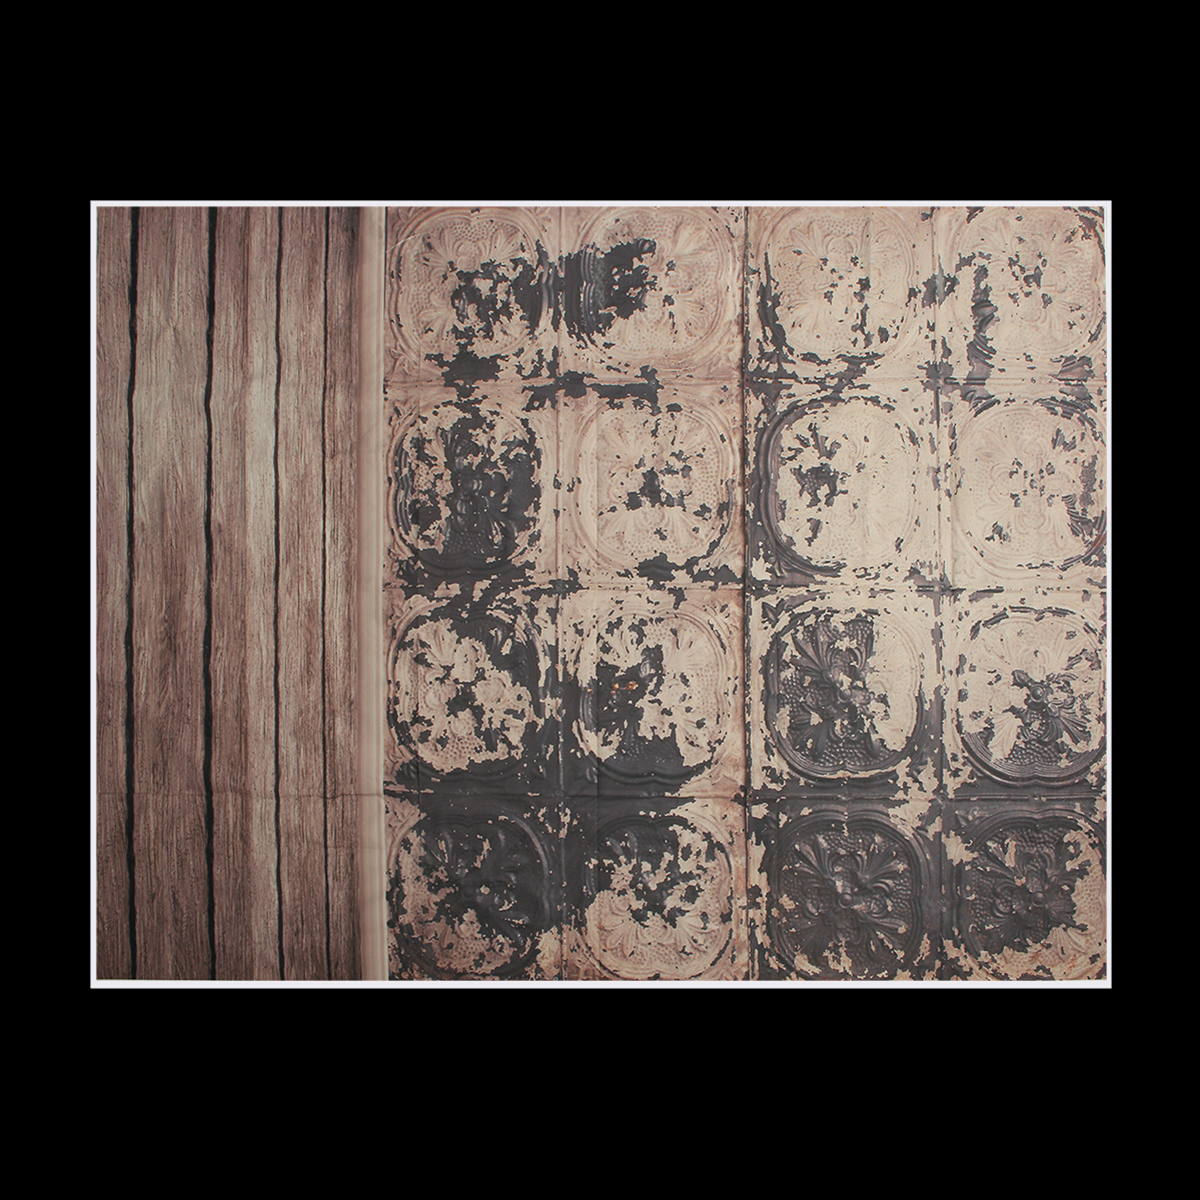 6x6FT Vinyl Wall Photography Backdrop,World Map,Ancient Civilizations Photo Backdrop Baby Newborn Photo Studio Props